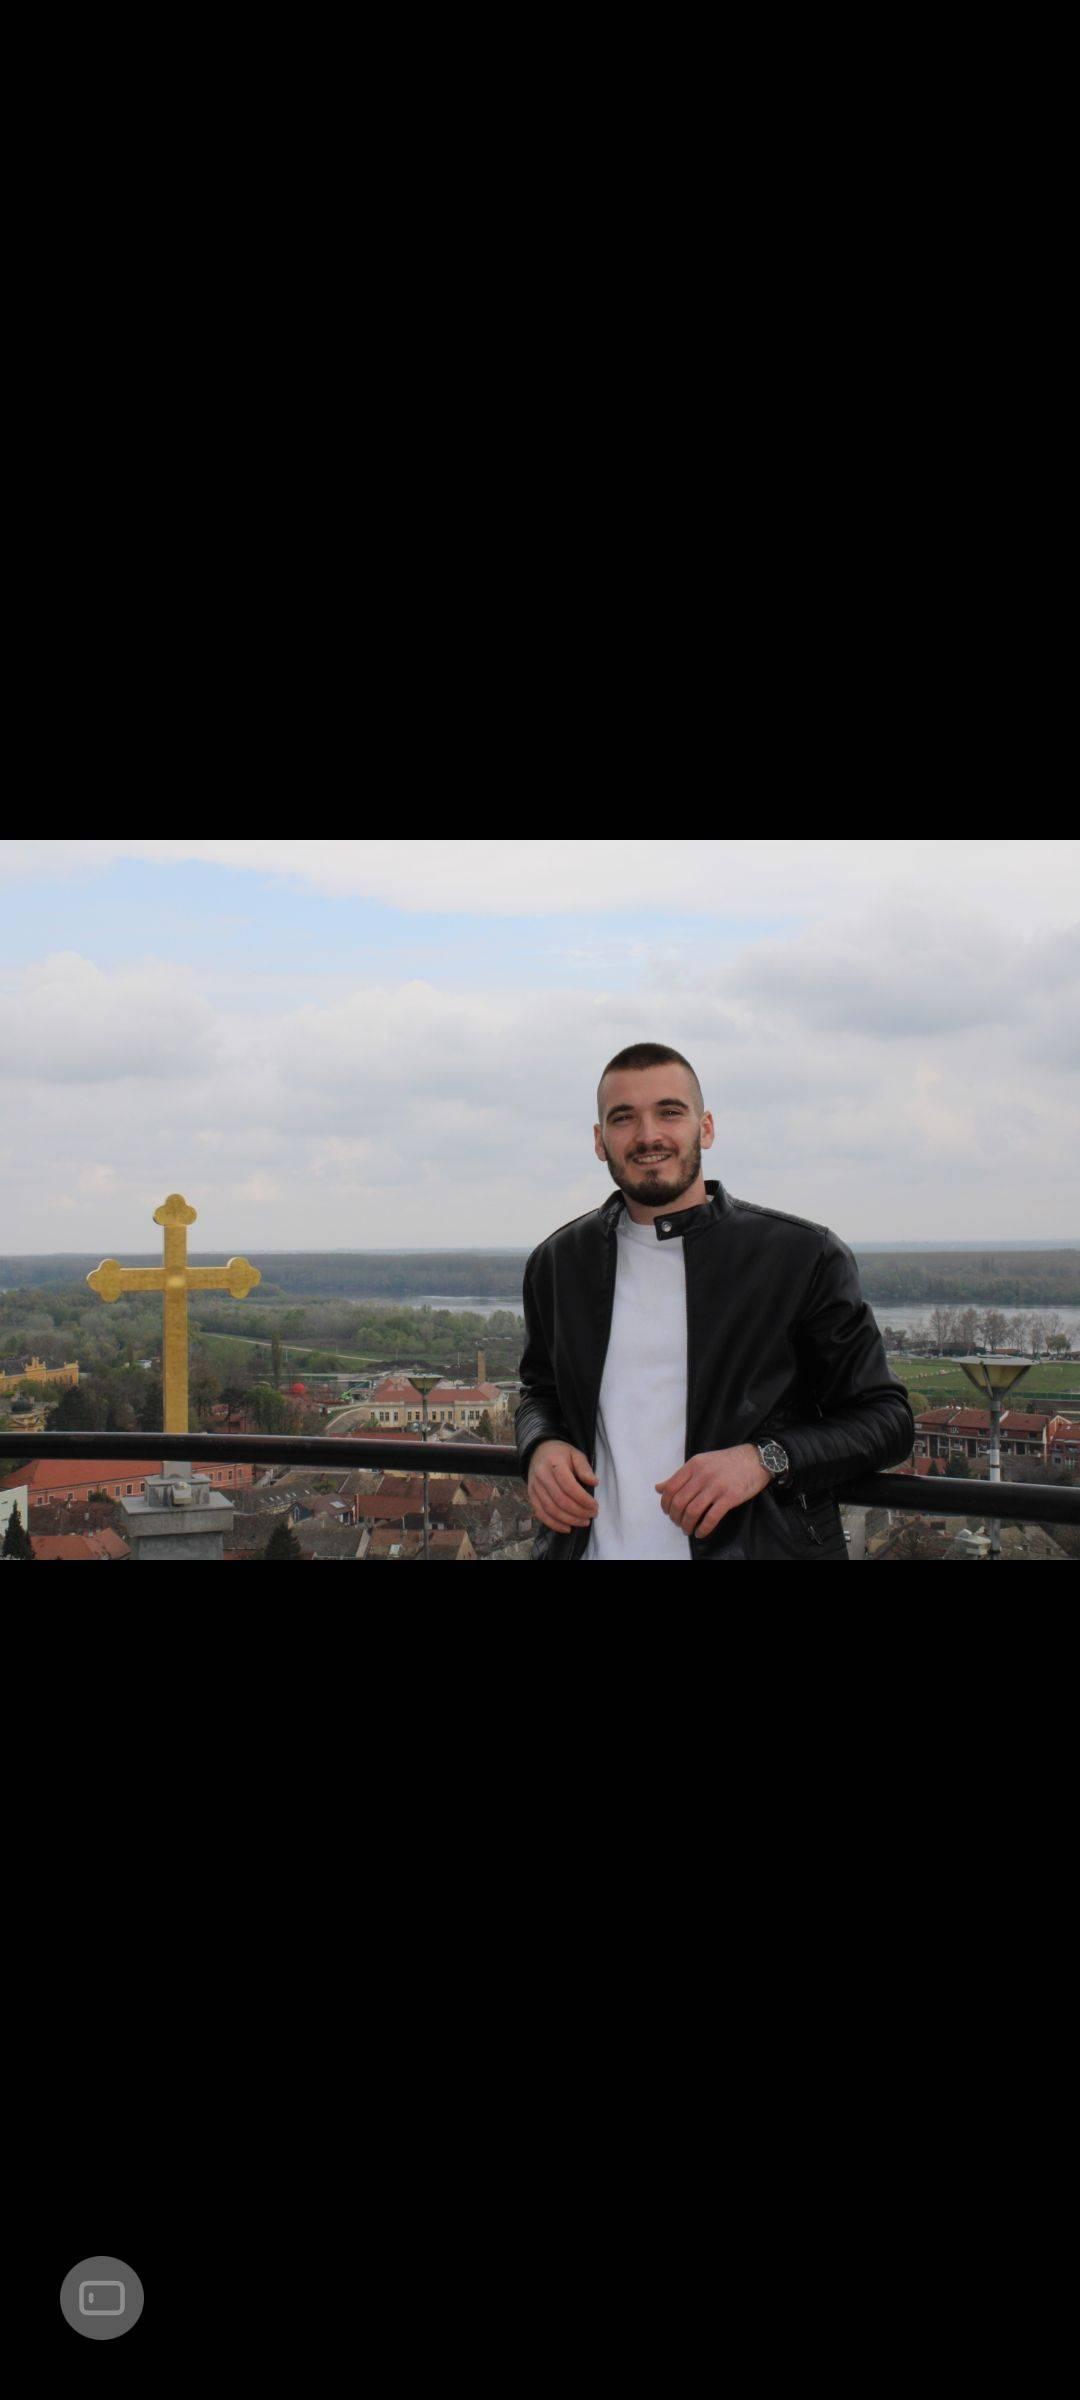 Miroslav_123